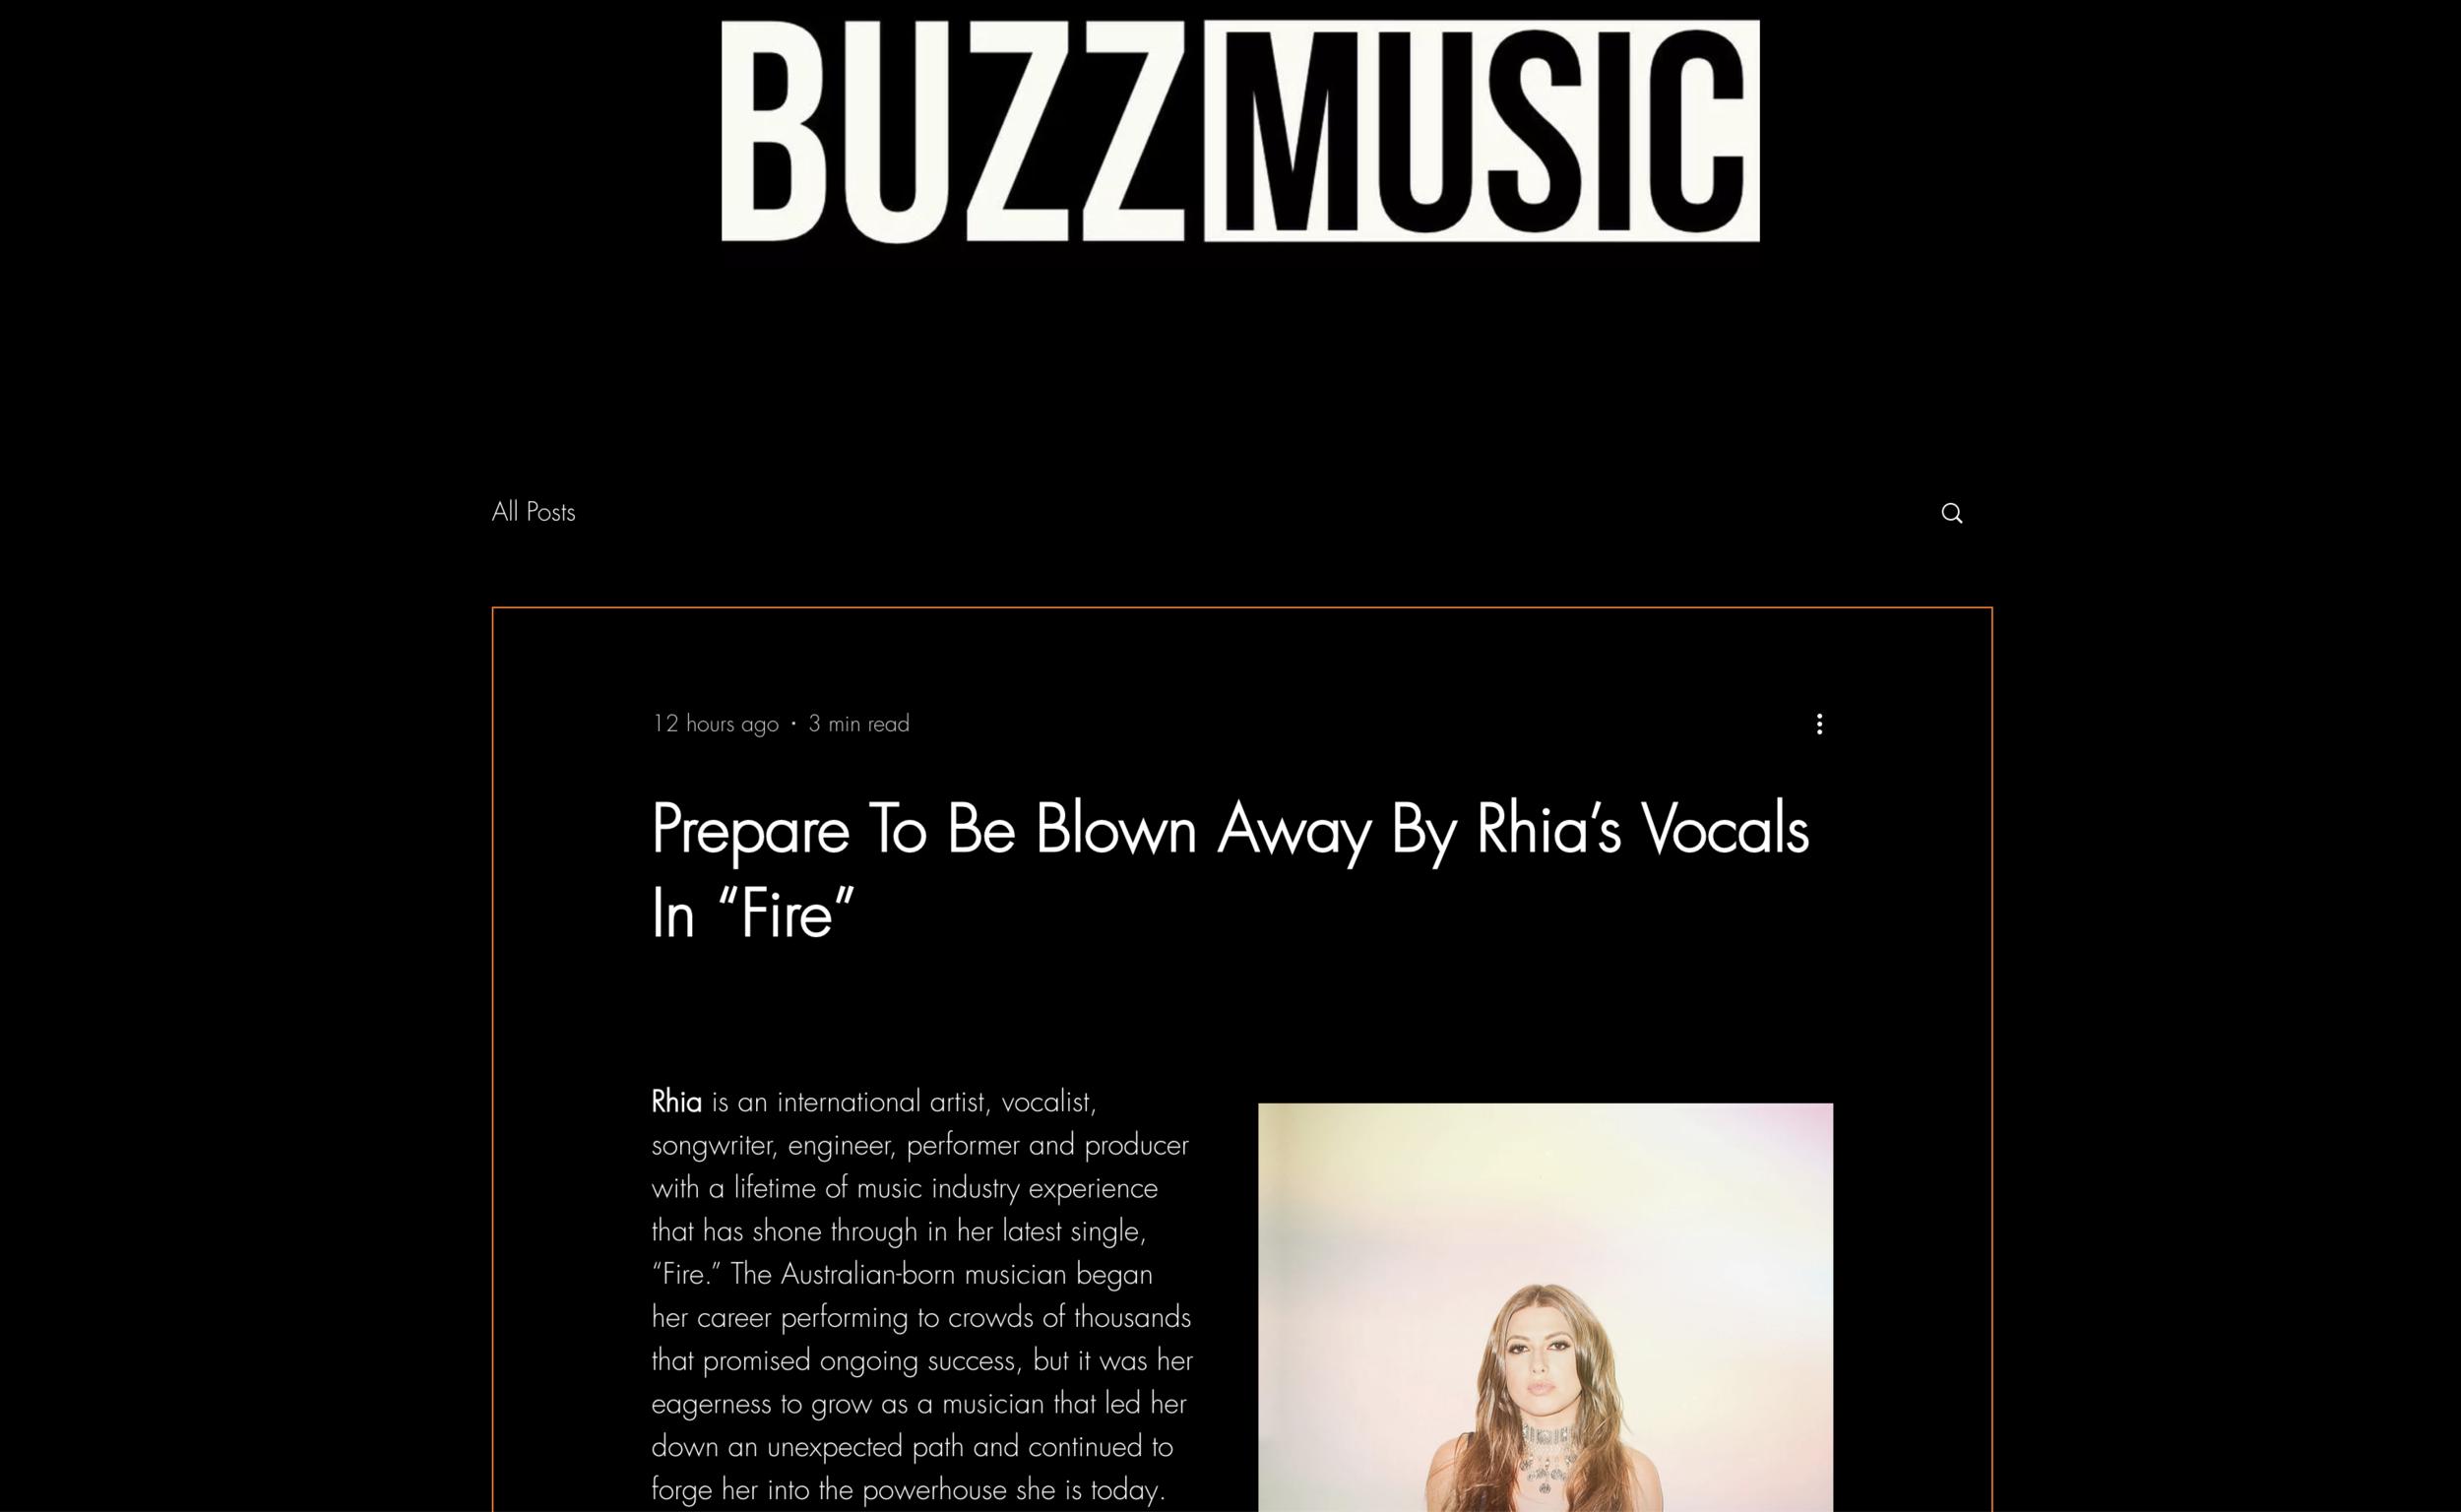 Rhia Buzz music buzzmusic rhiamusic official fire beyonce.png